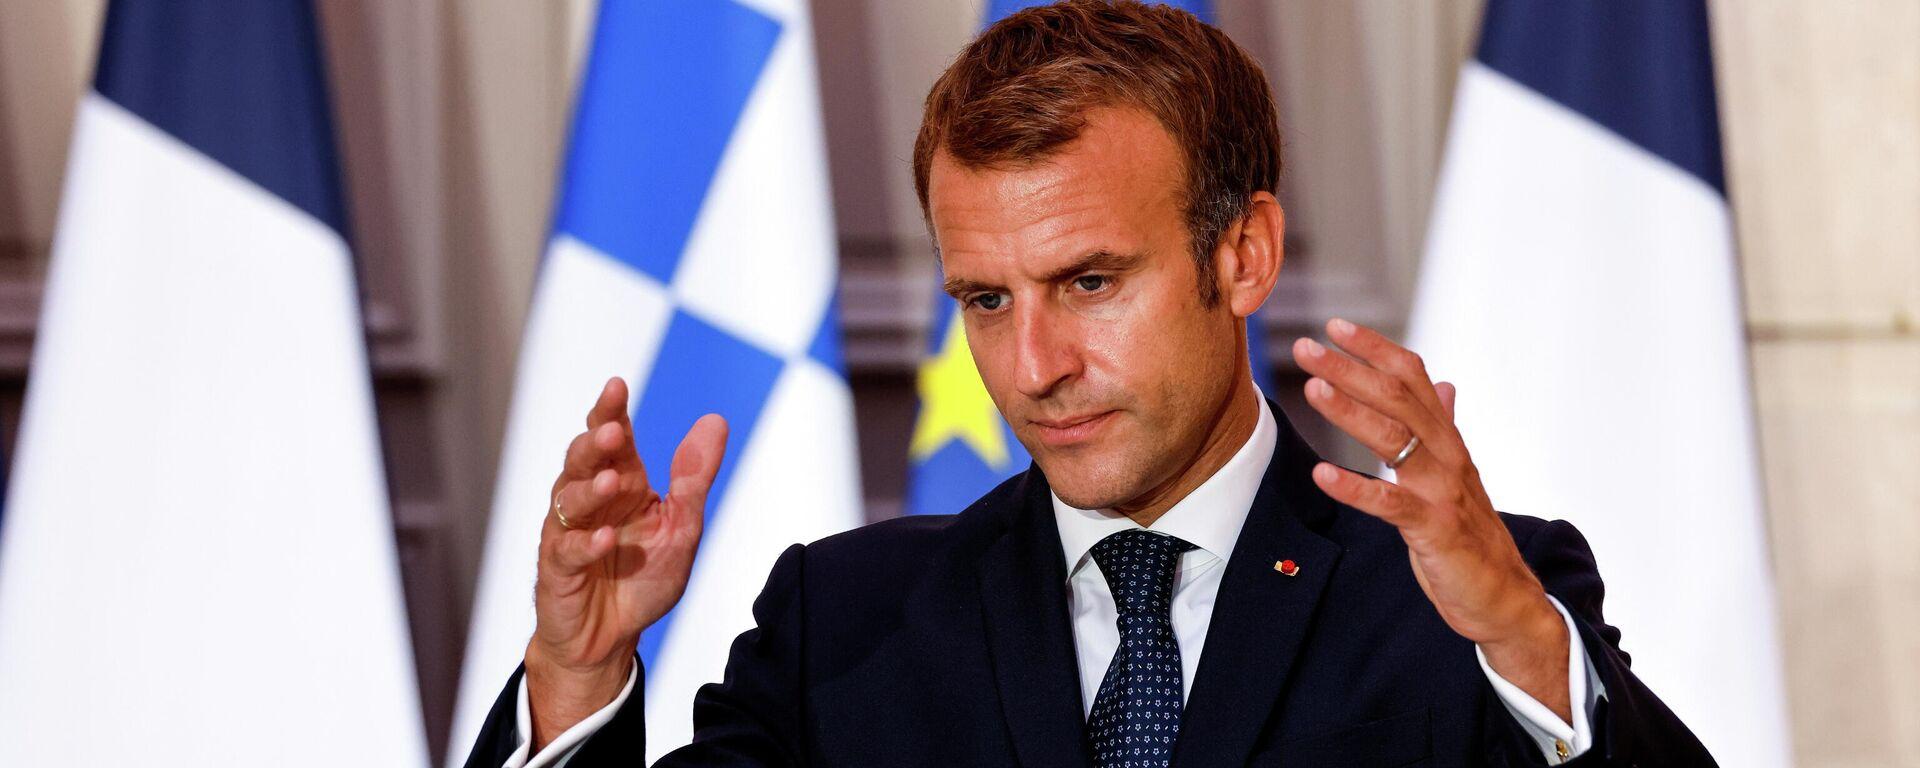 El presidente de Francia, Emmanuel Macron - Sputnik Mundo, 1920, 28.09.2021